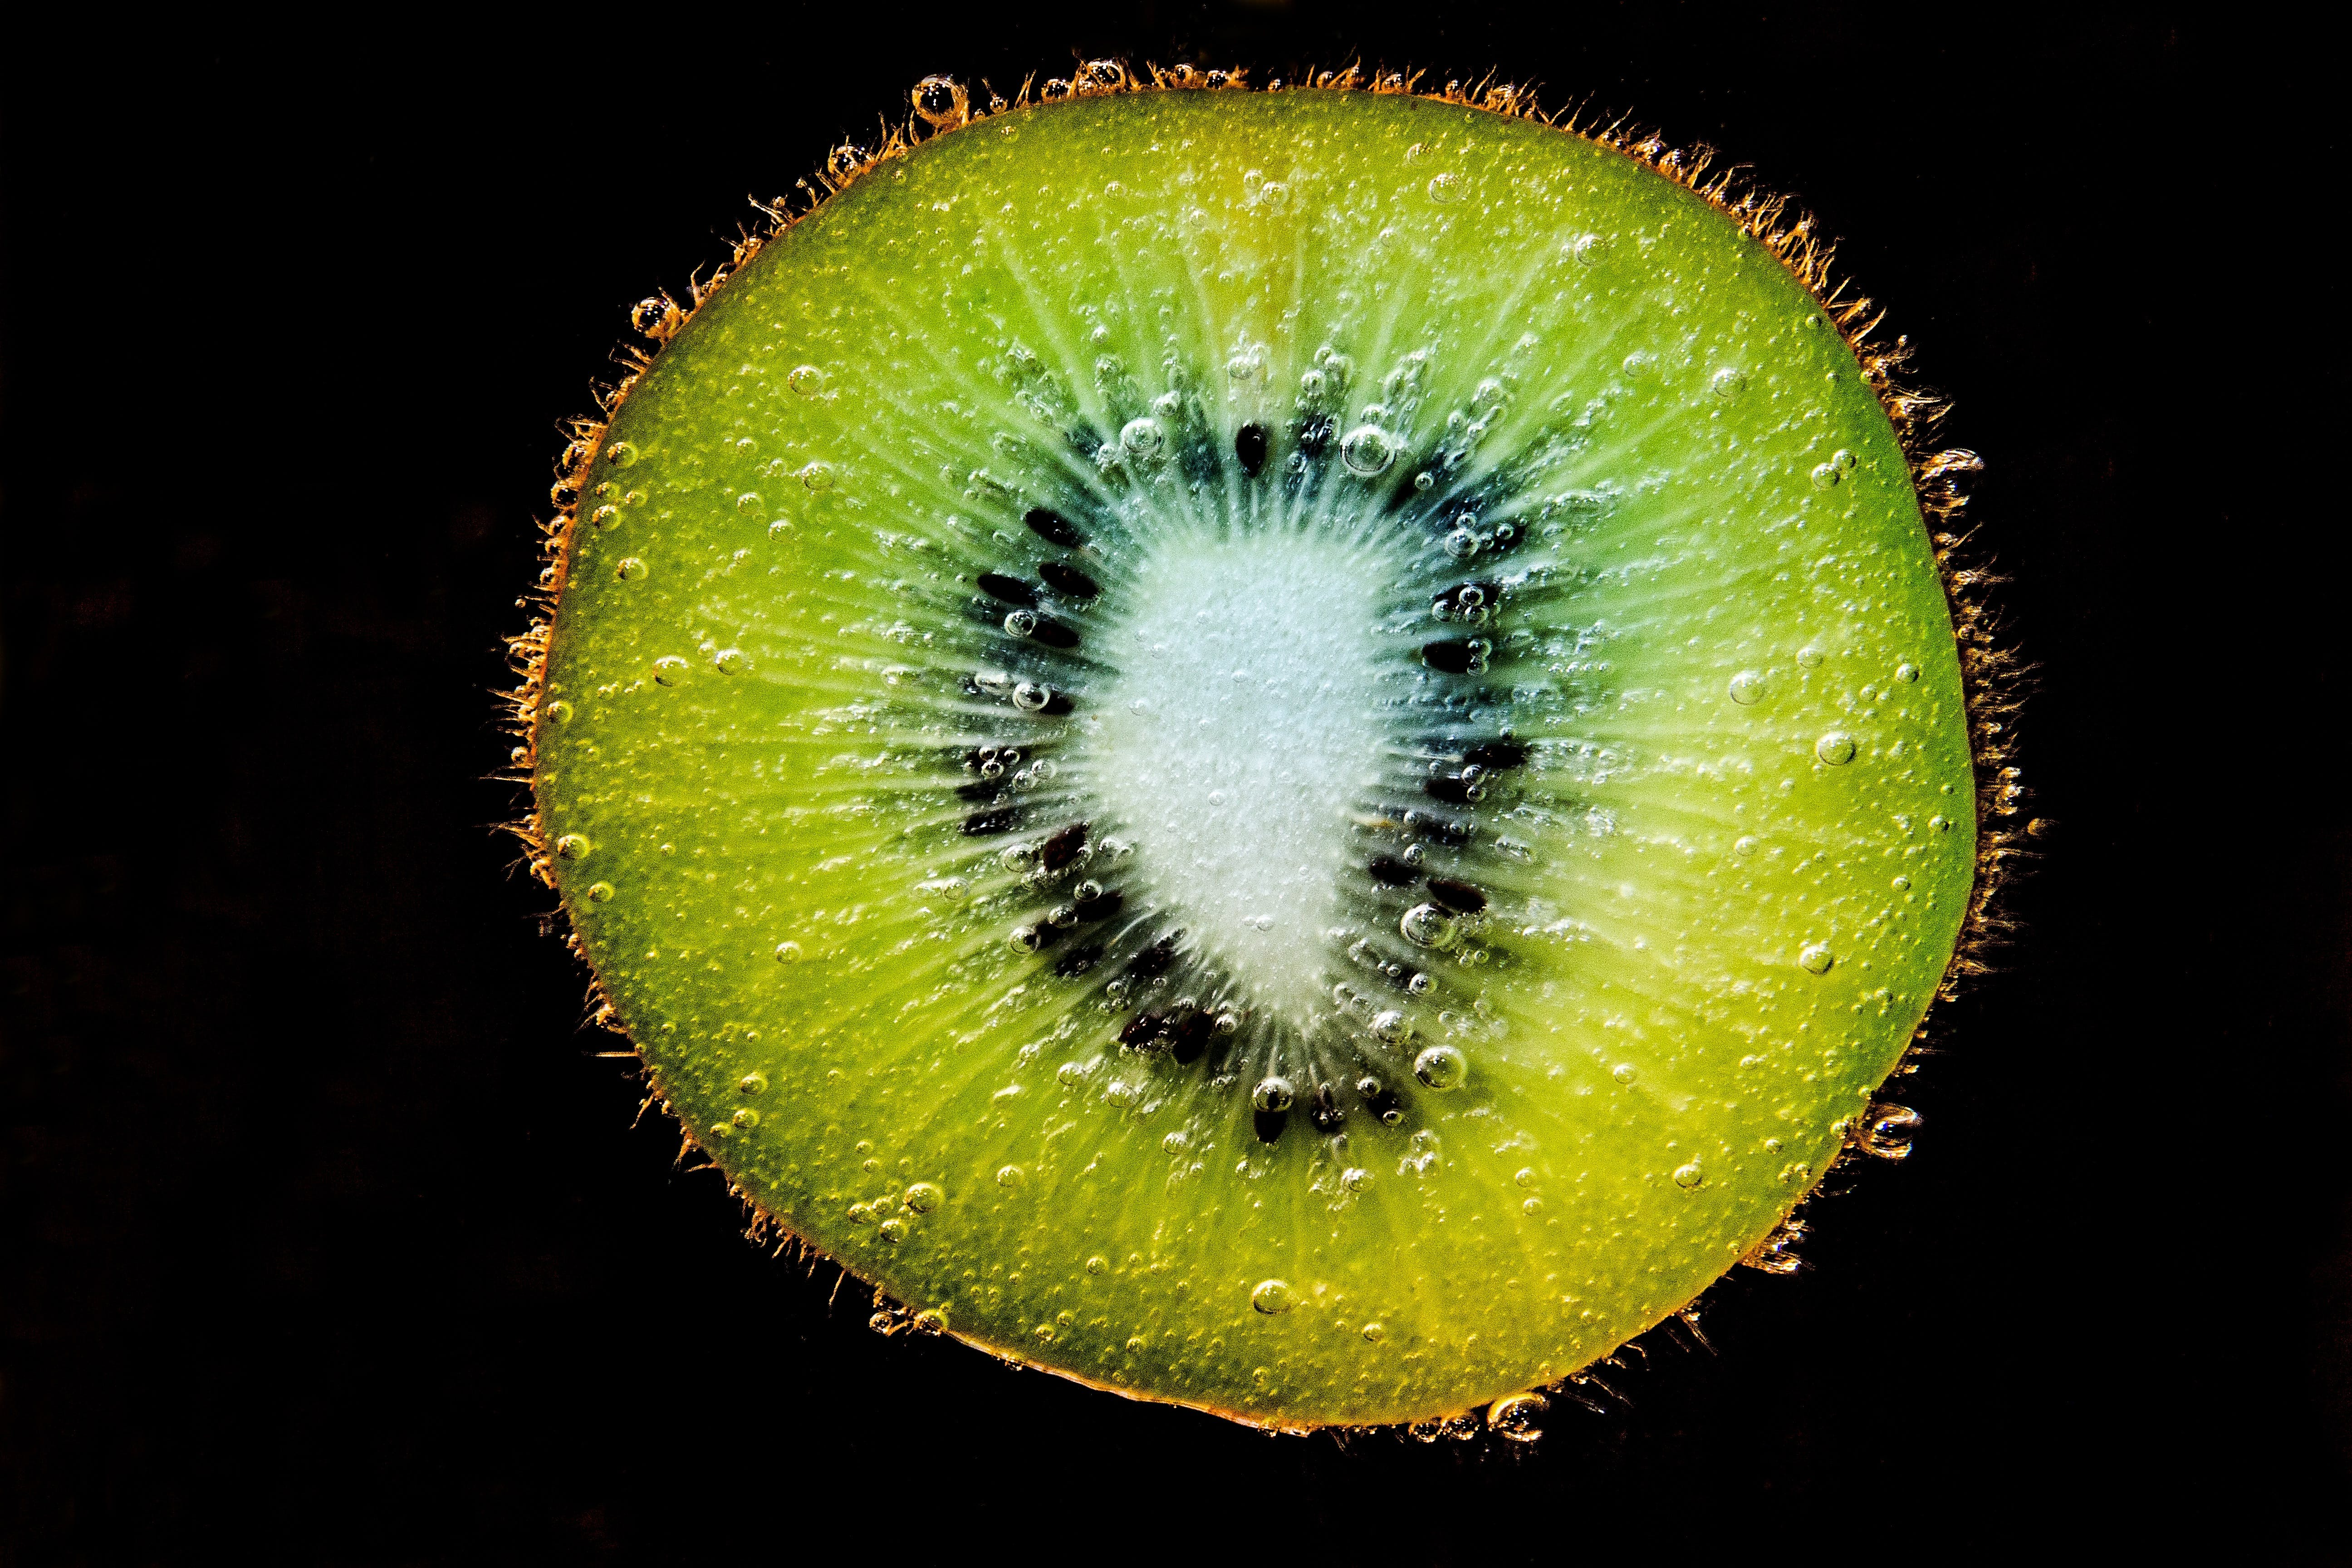 Close-up of Fruit Against Black Background